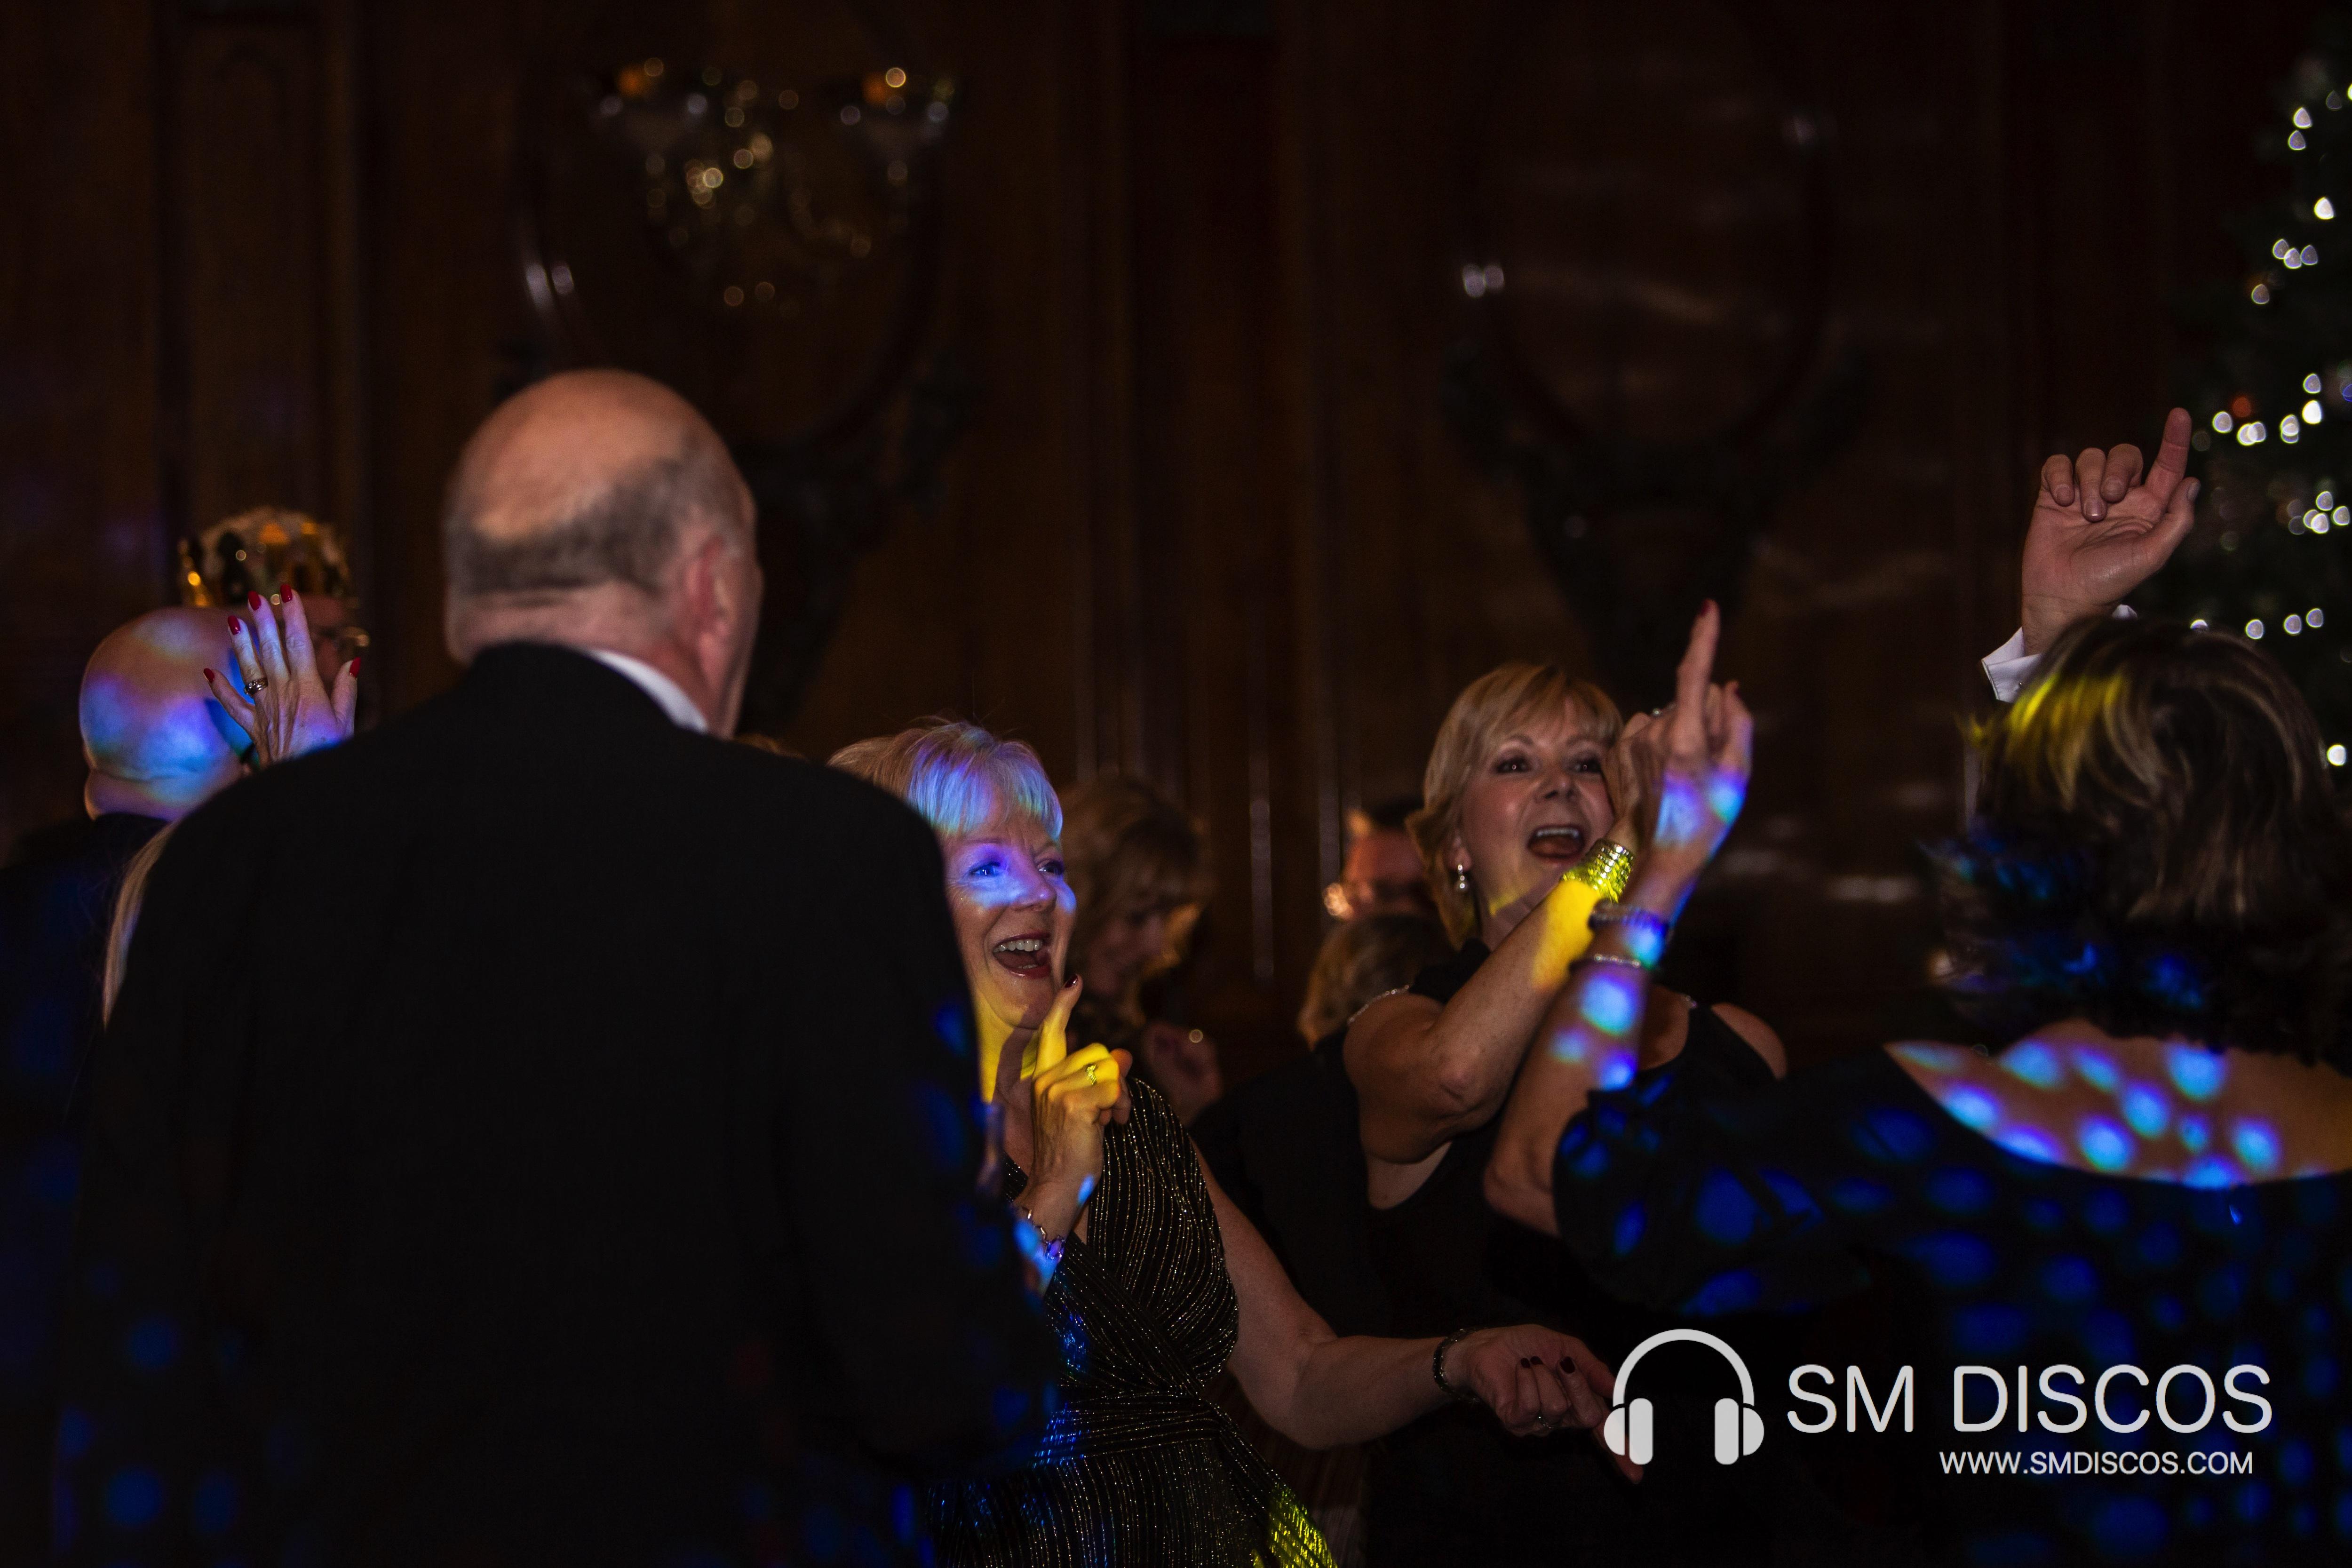 Ashridge House with SM Discos